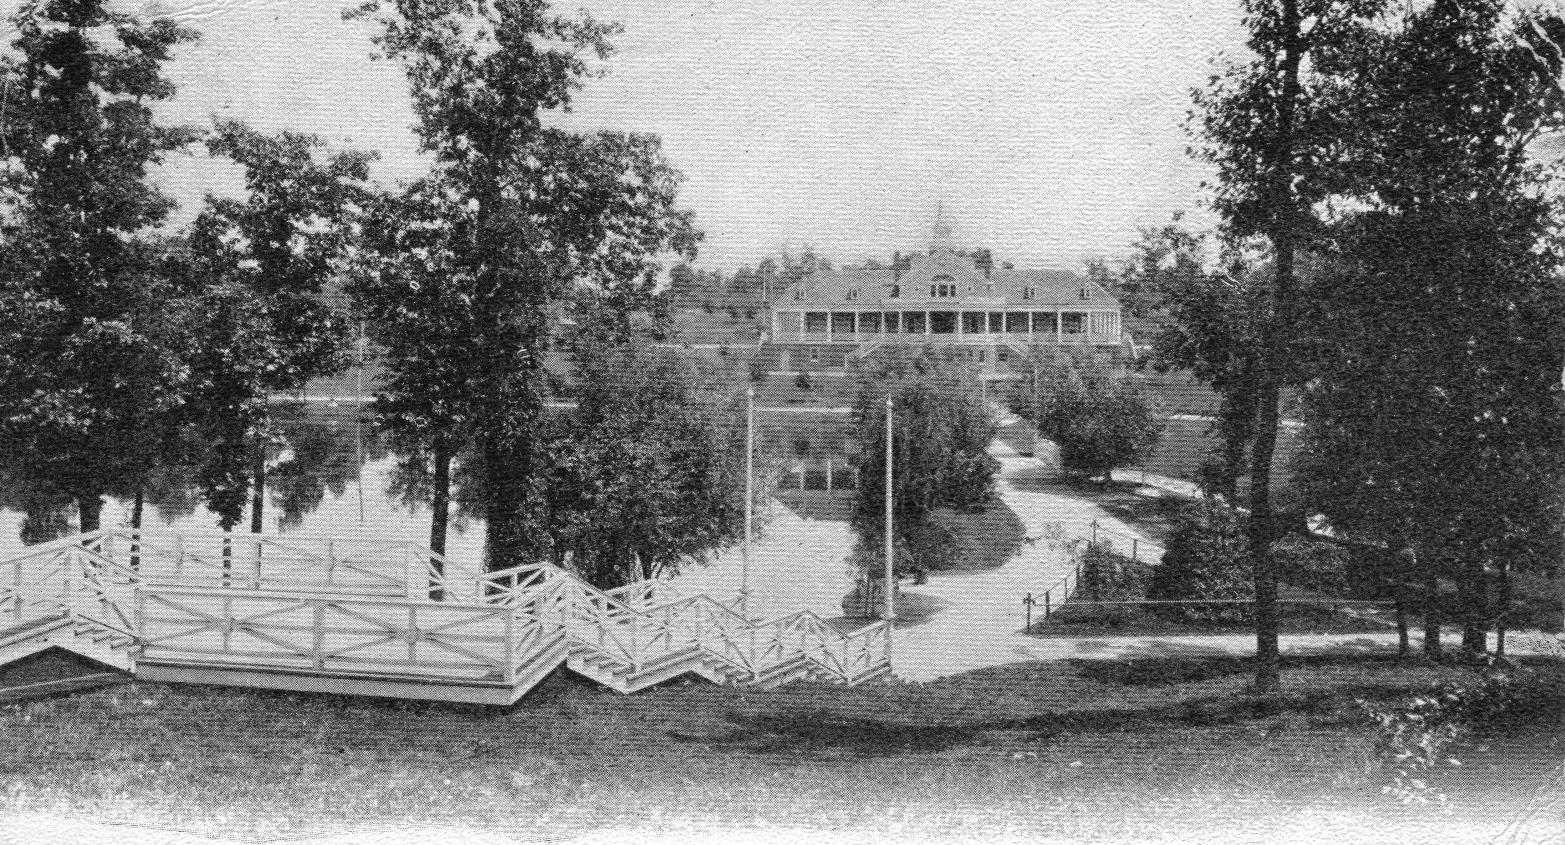 Lords-Park-Pavilion-1905.jpg